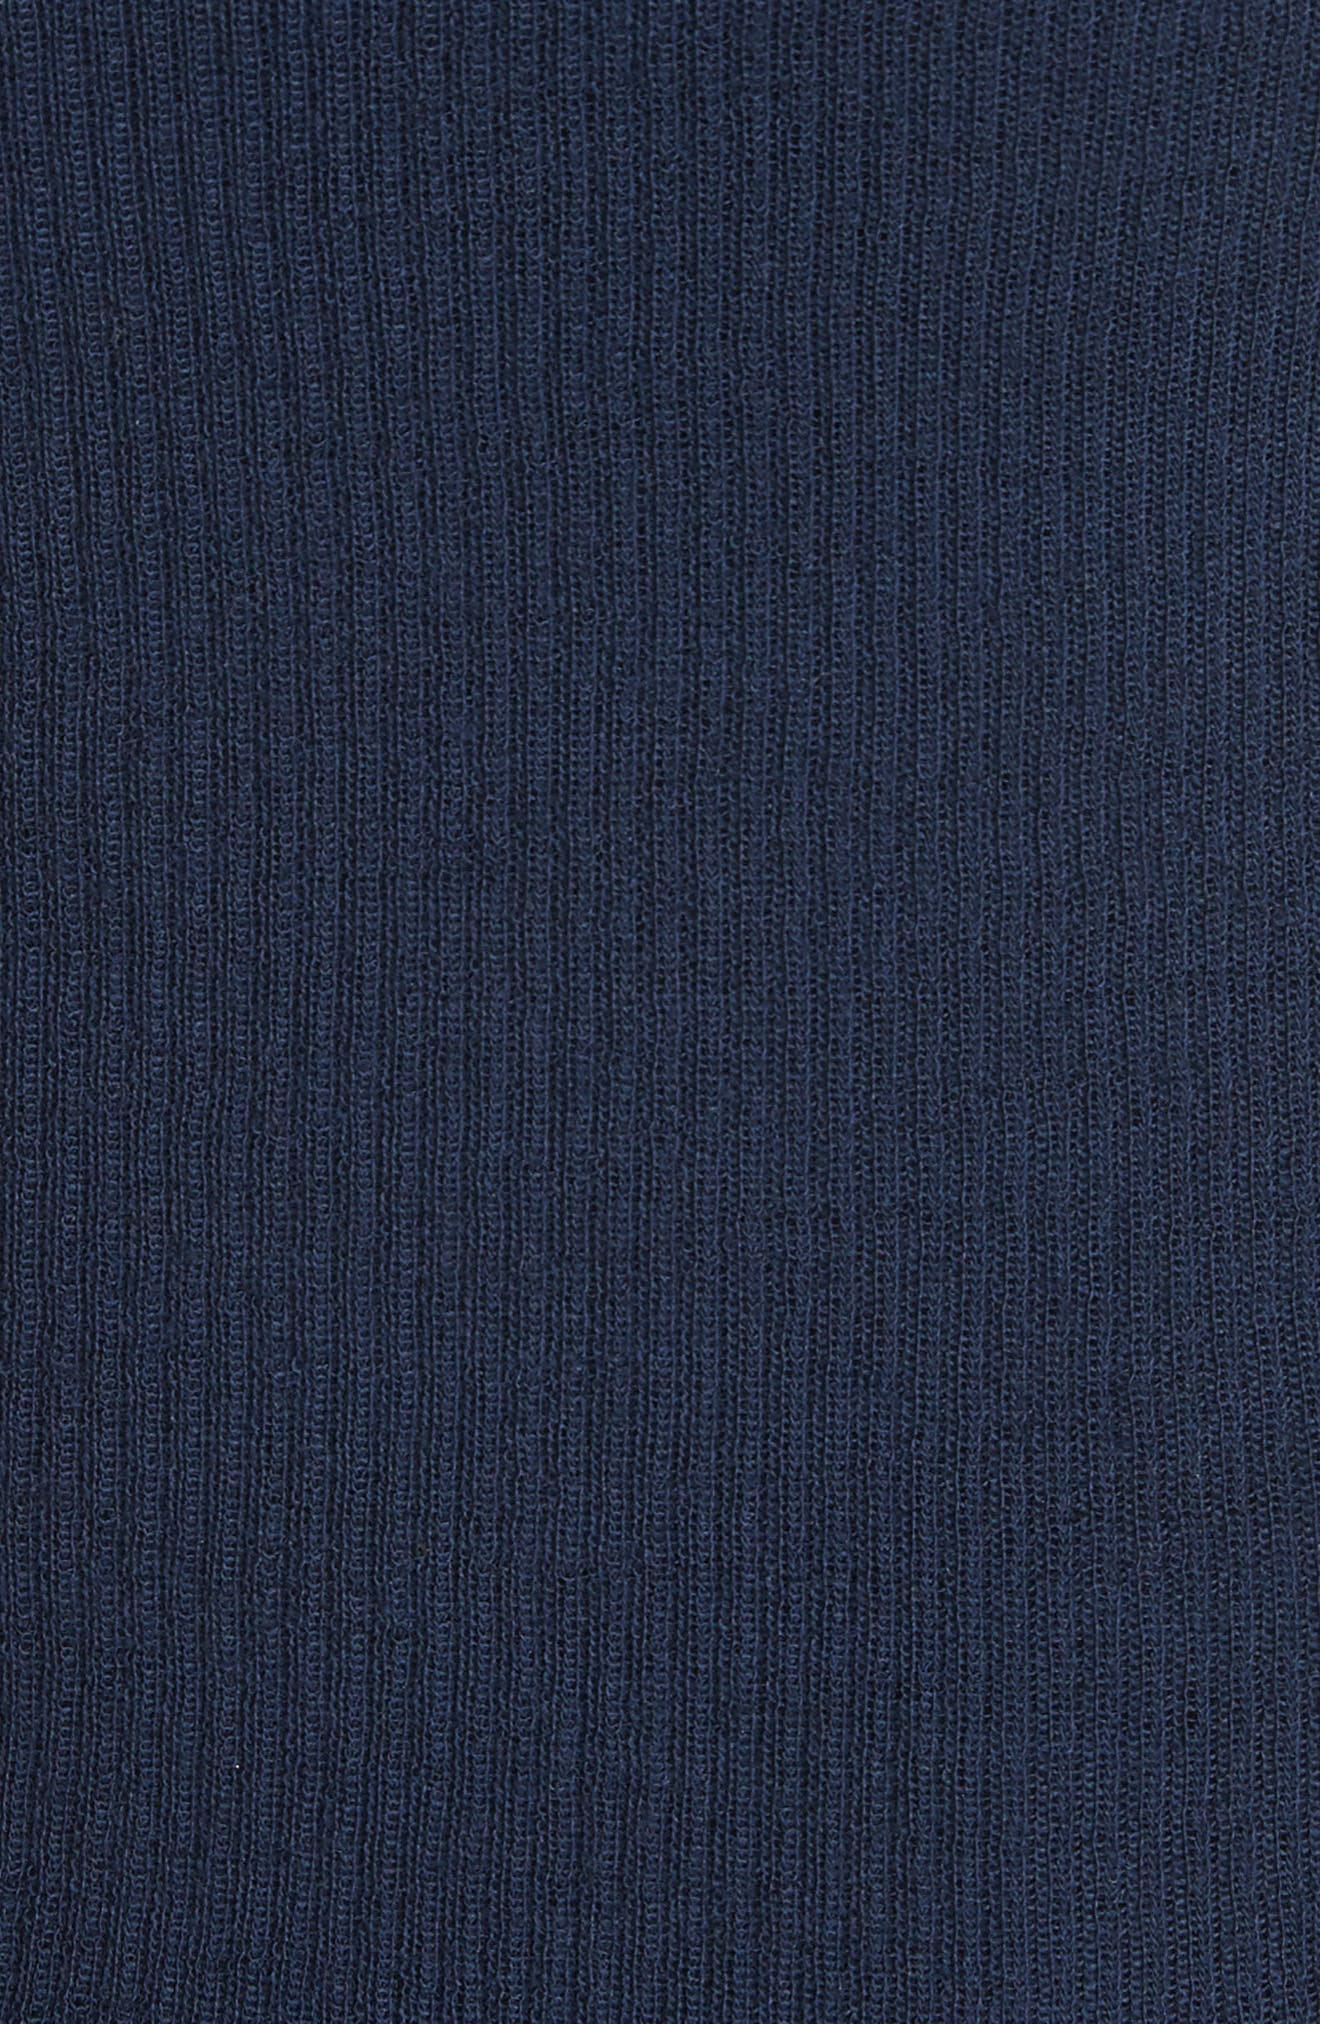 Stripe Cuff Wool Sweater,                             Alternate thumbnail 5, color,                             Coastal/ Optic White